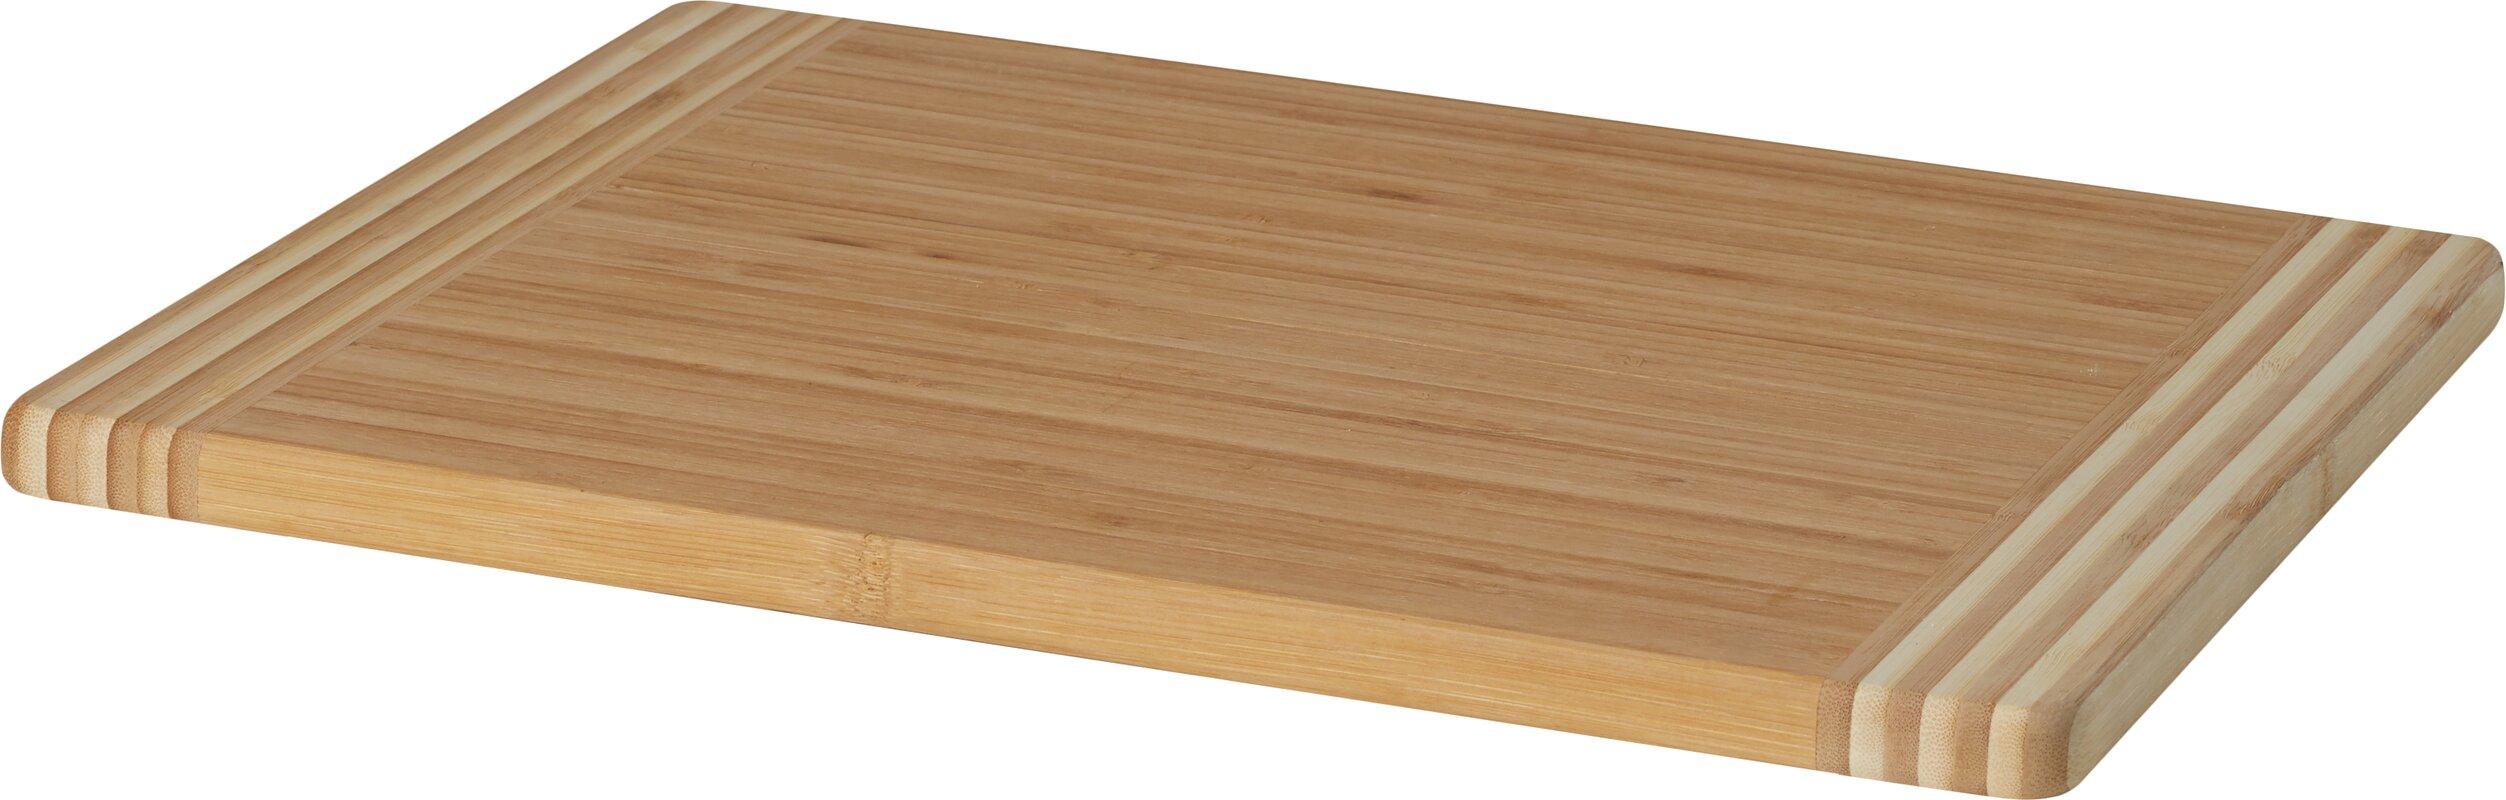 zeller schneidebrett aus bambus. Black Bedroom Furniture Sets. Home Design Ideas